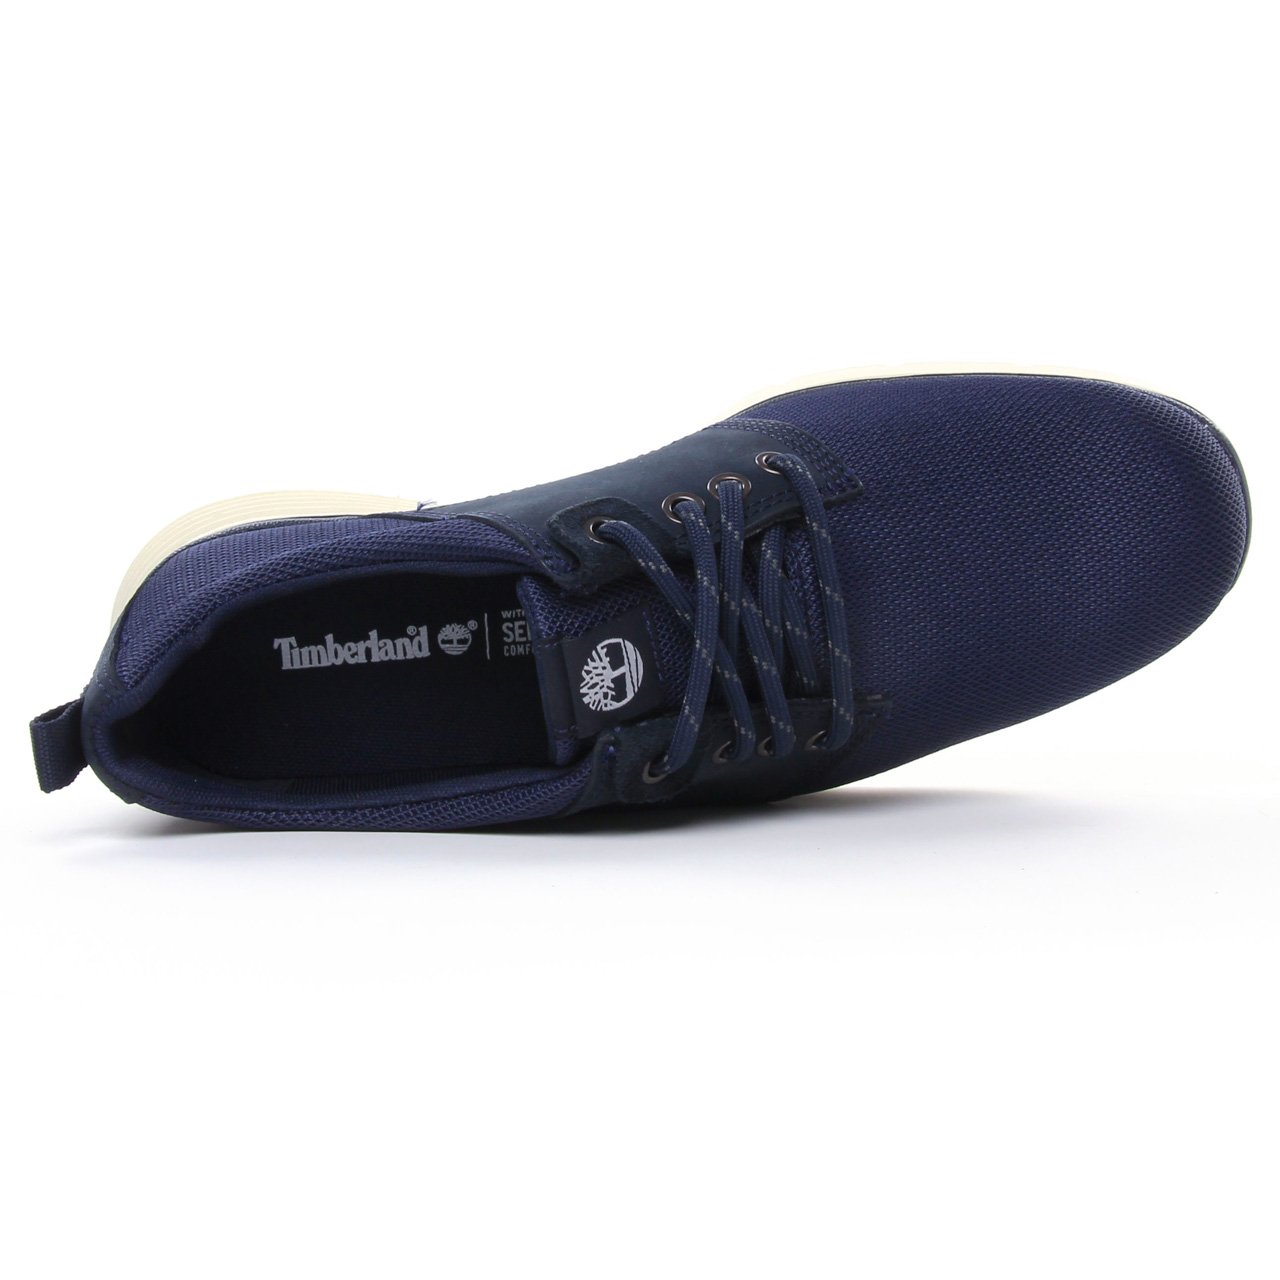 Timberland Killington Black Iris   tennis bleu noir